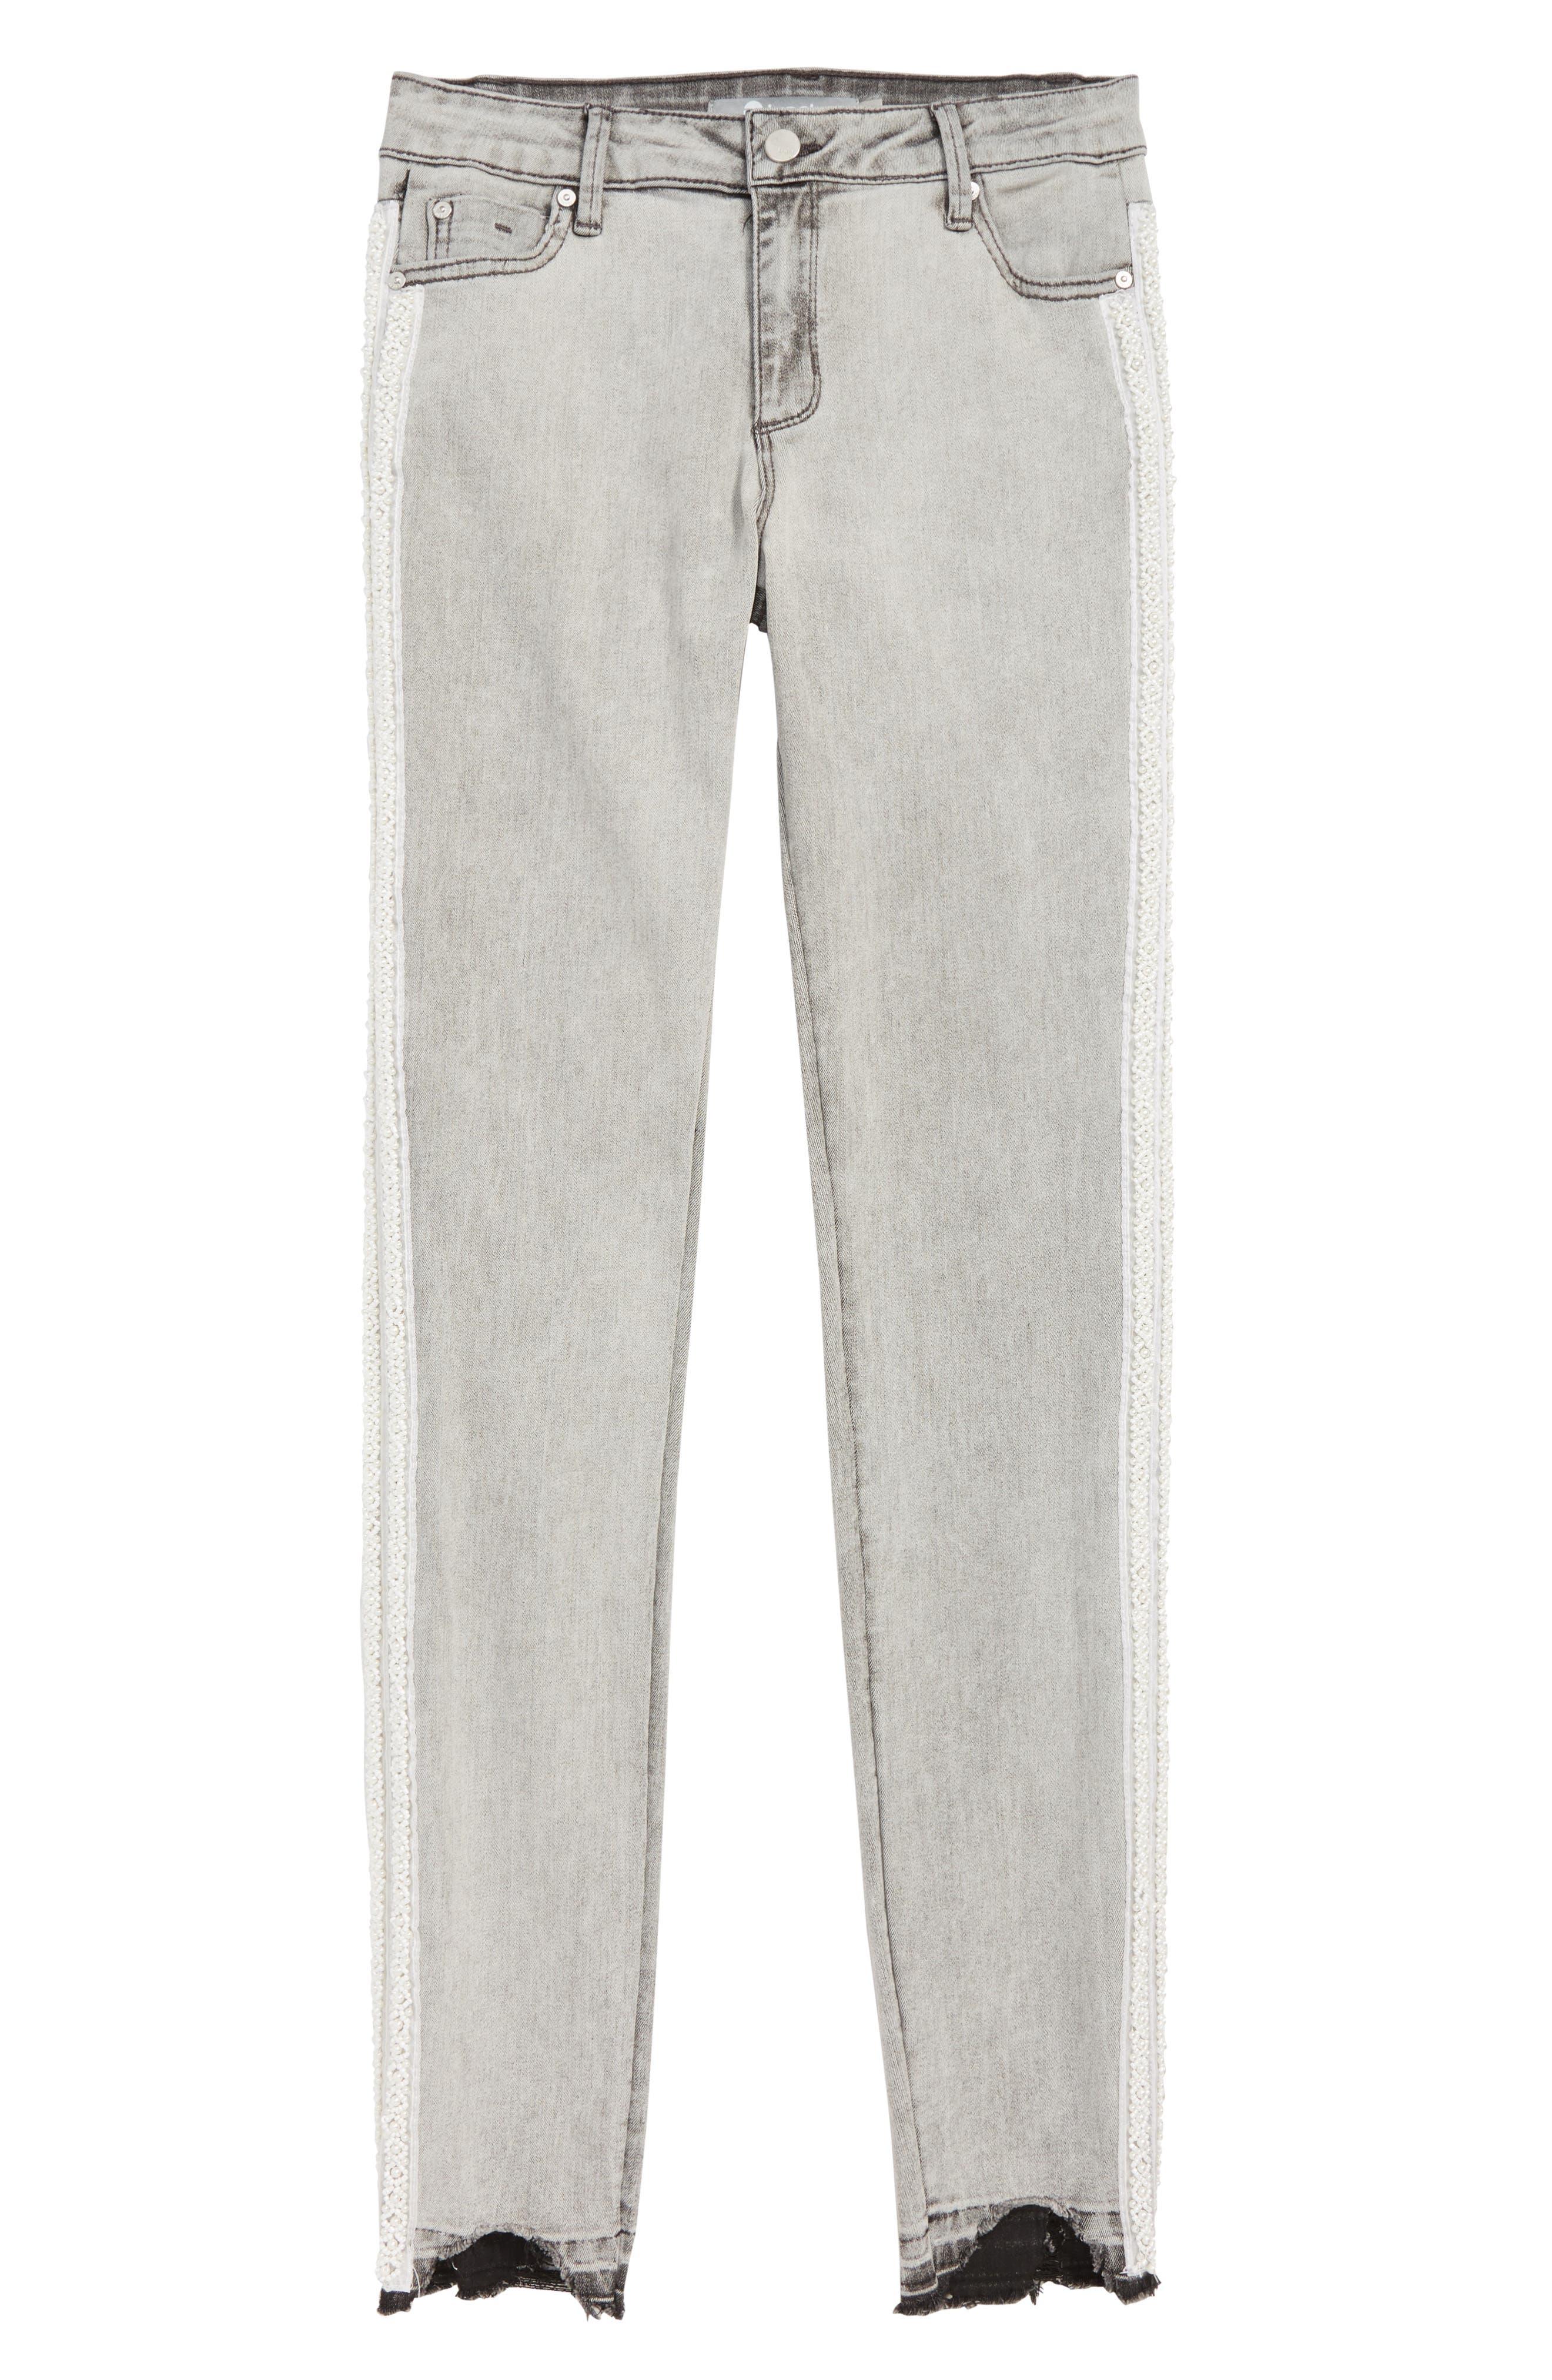 Embellished Tuxedo Stripe Skinny Jeans,                             Main thumbnail 1, color,                             CHARCOAL